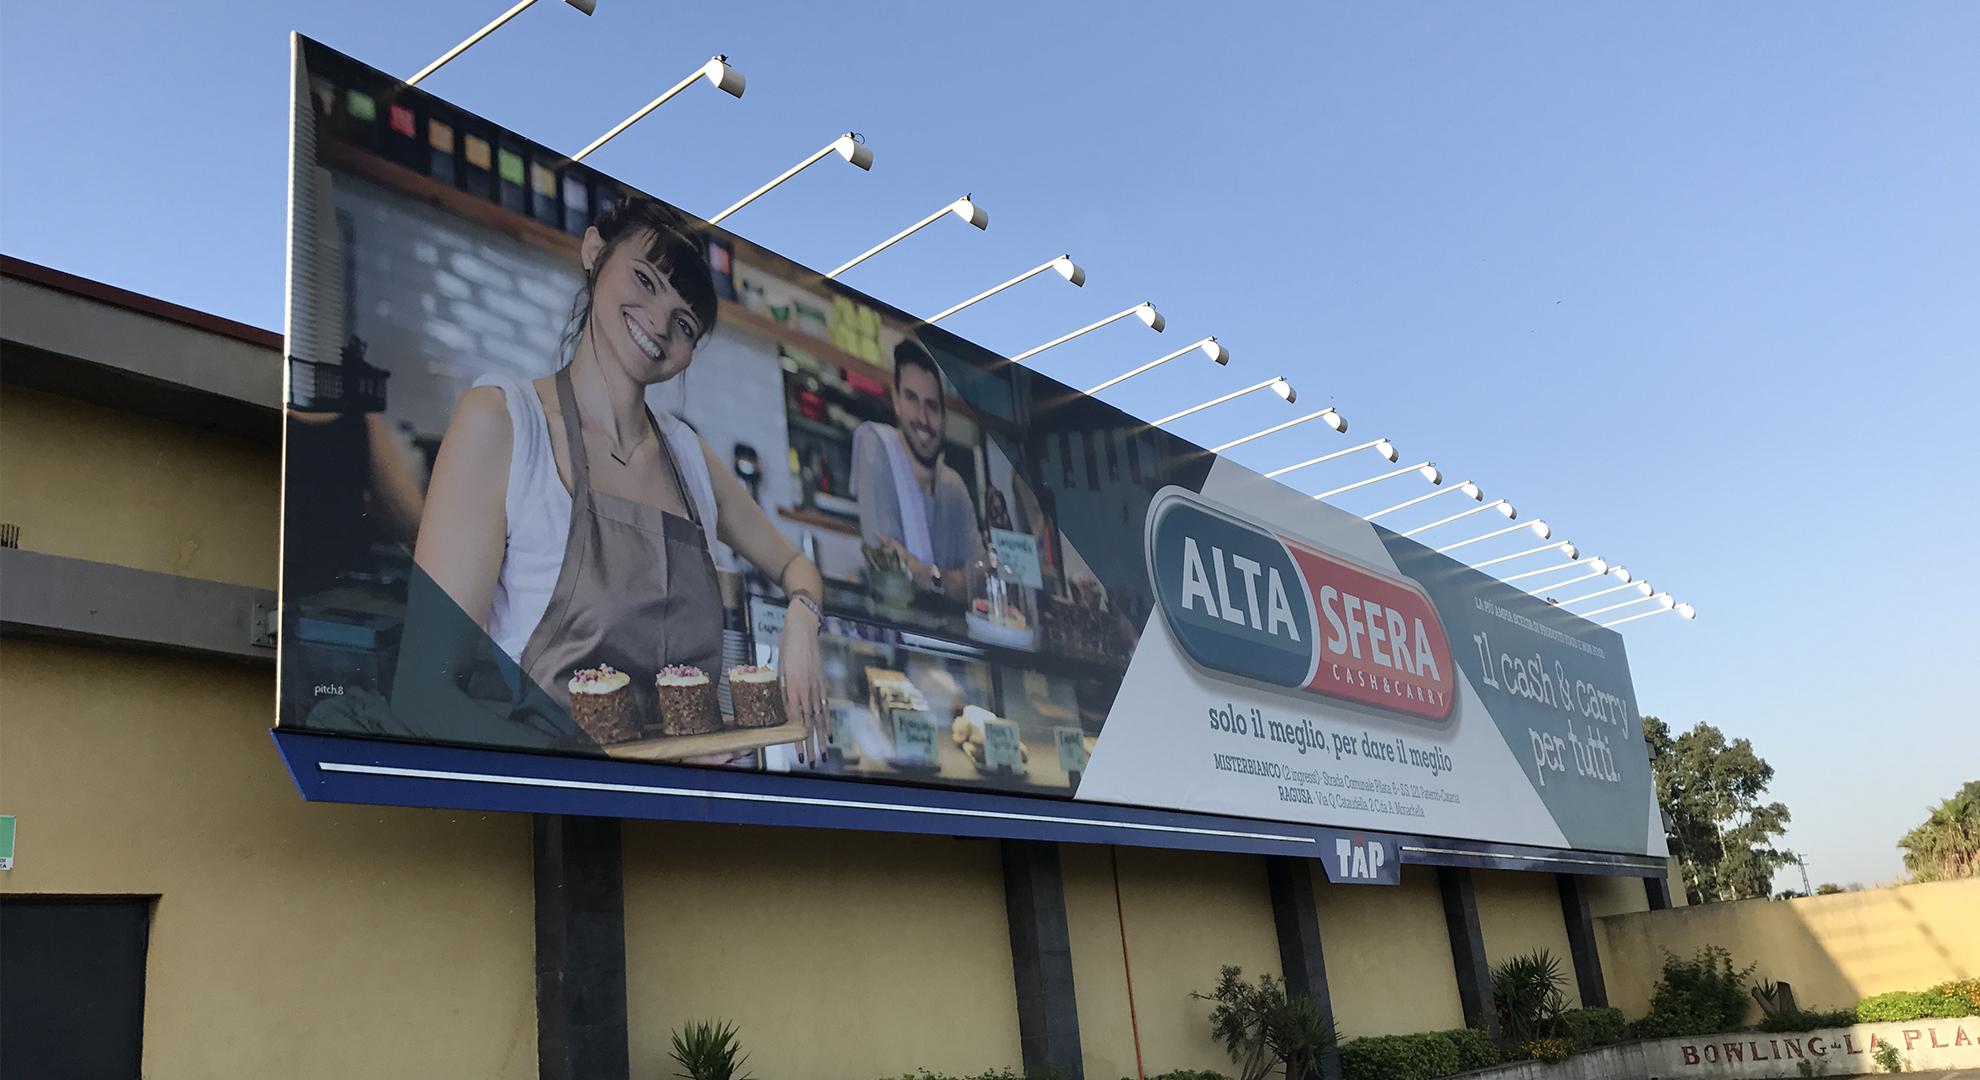 impianto pubblicitario